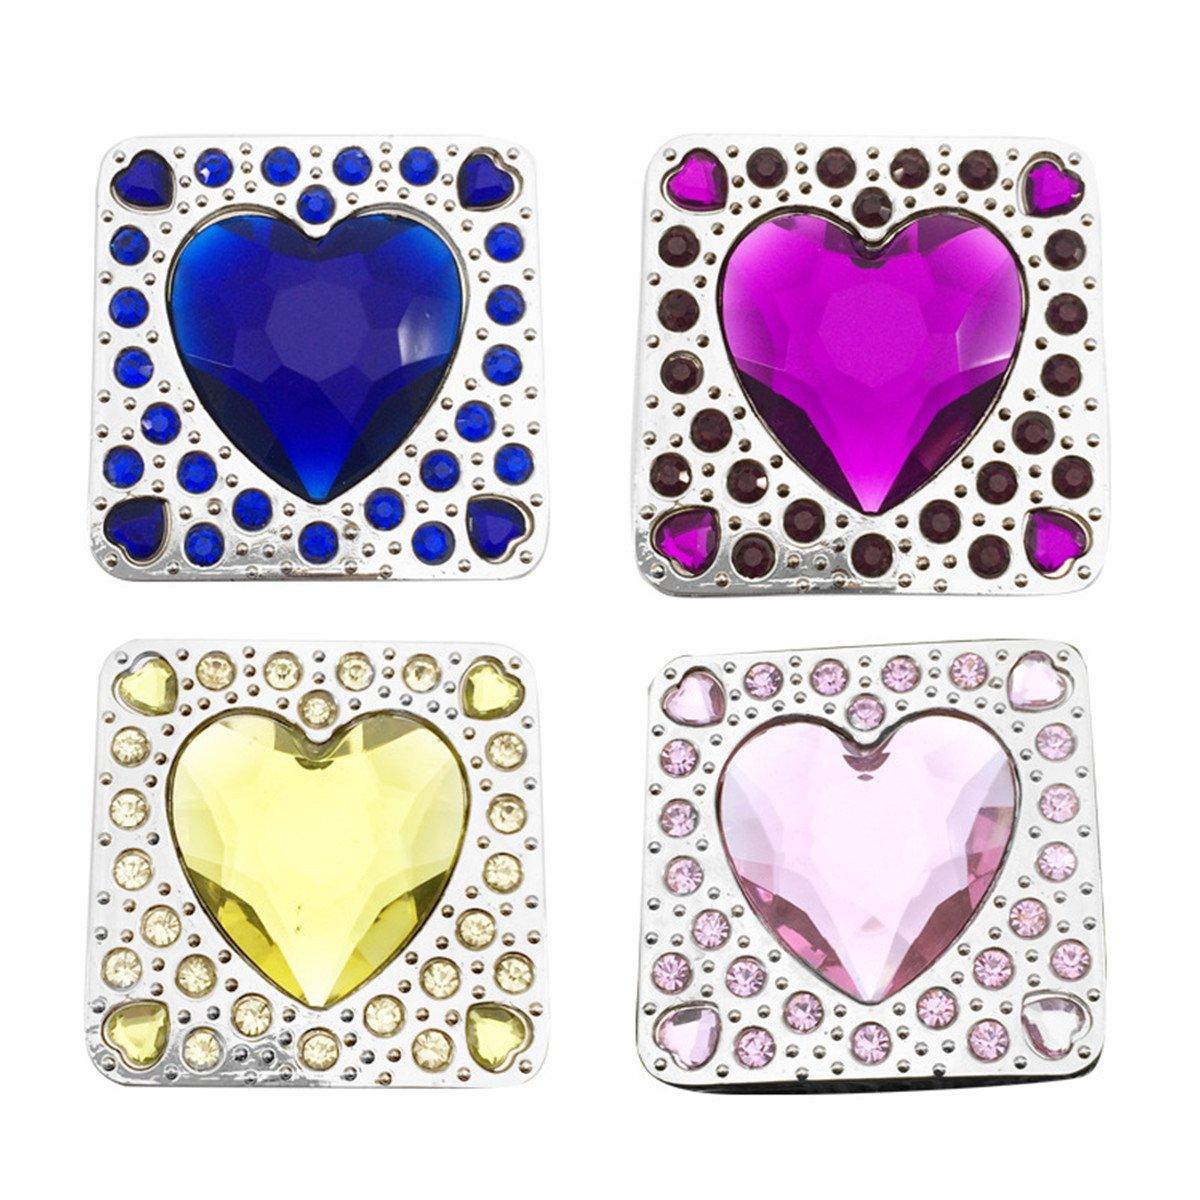 Reizteko Purse Hook,Square Shape Heart Love Rhinestone Foldable Handbag Purse Hanger Hook Holder for Tables (Pack of 4)